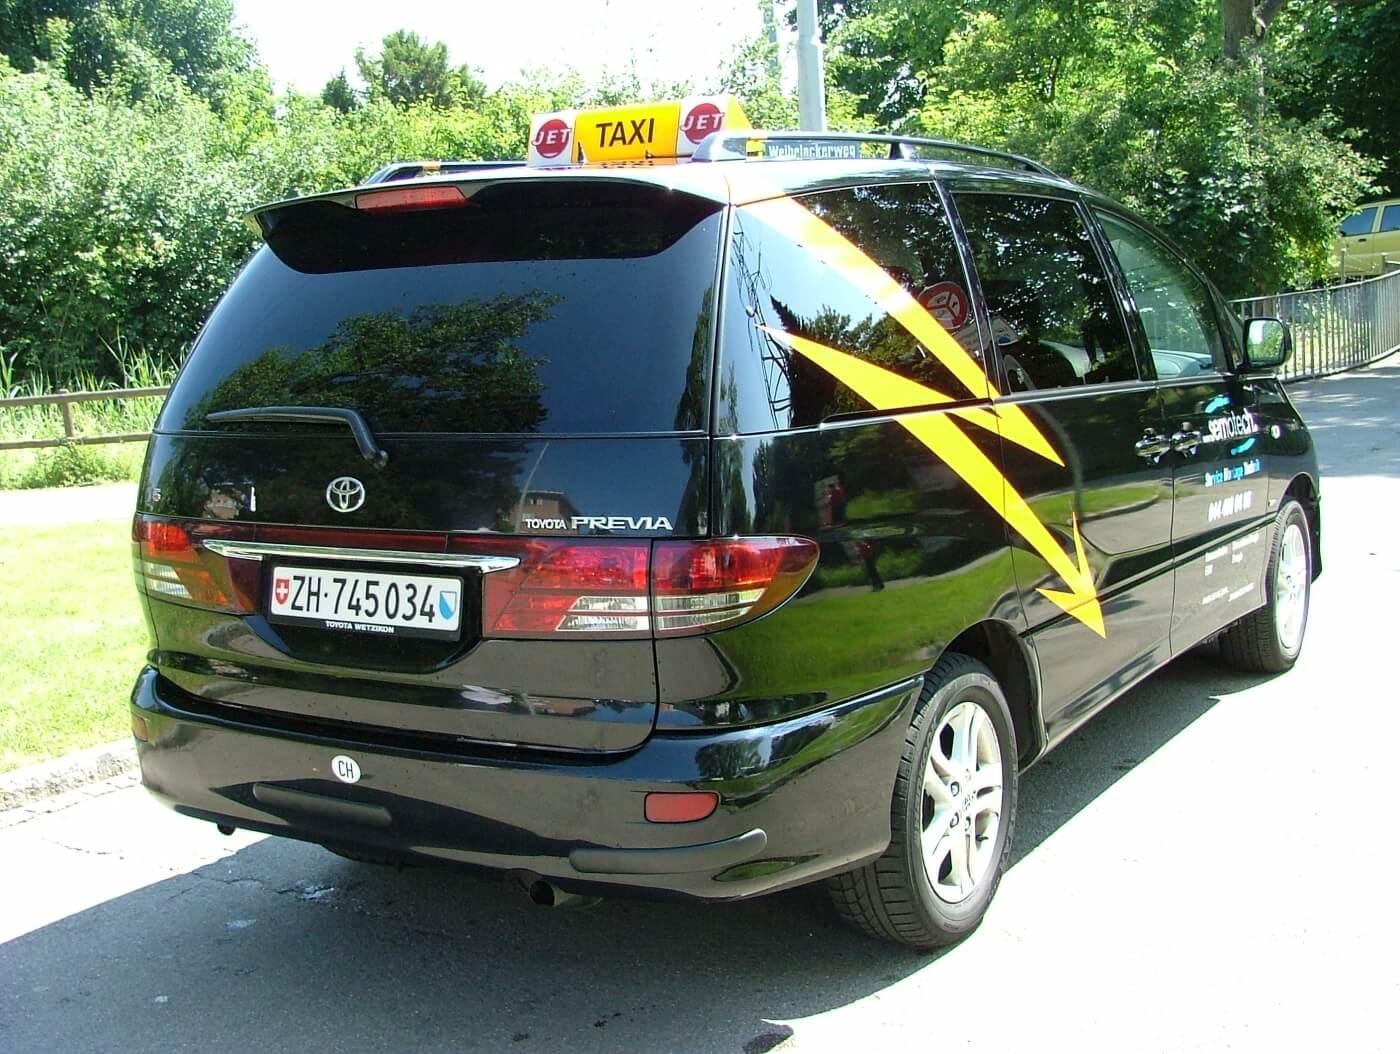 Jet Taxi Bülach – 044 514 55 55